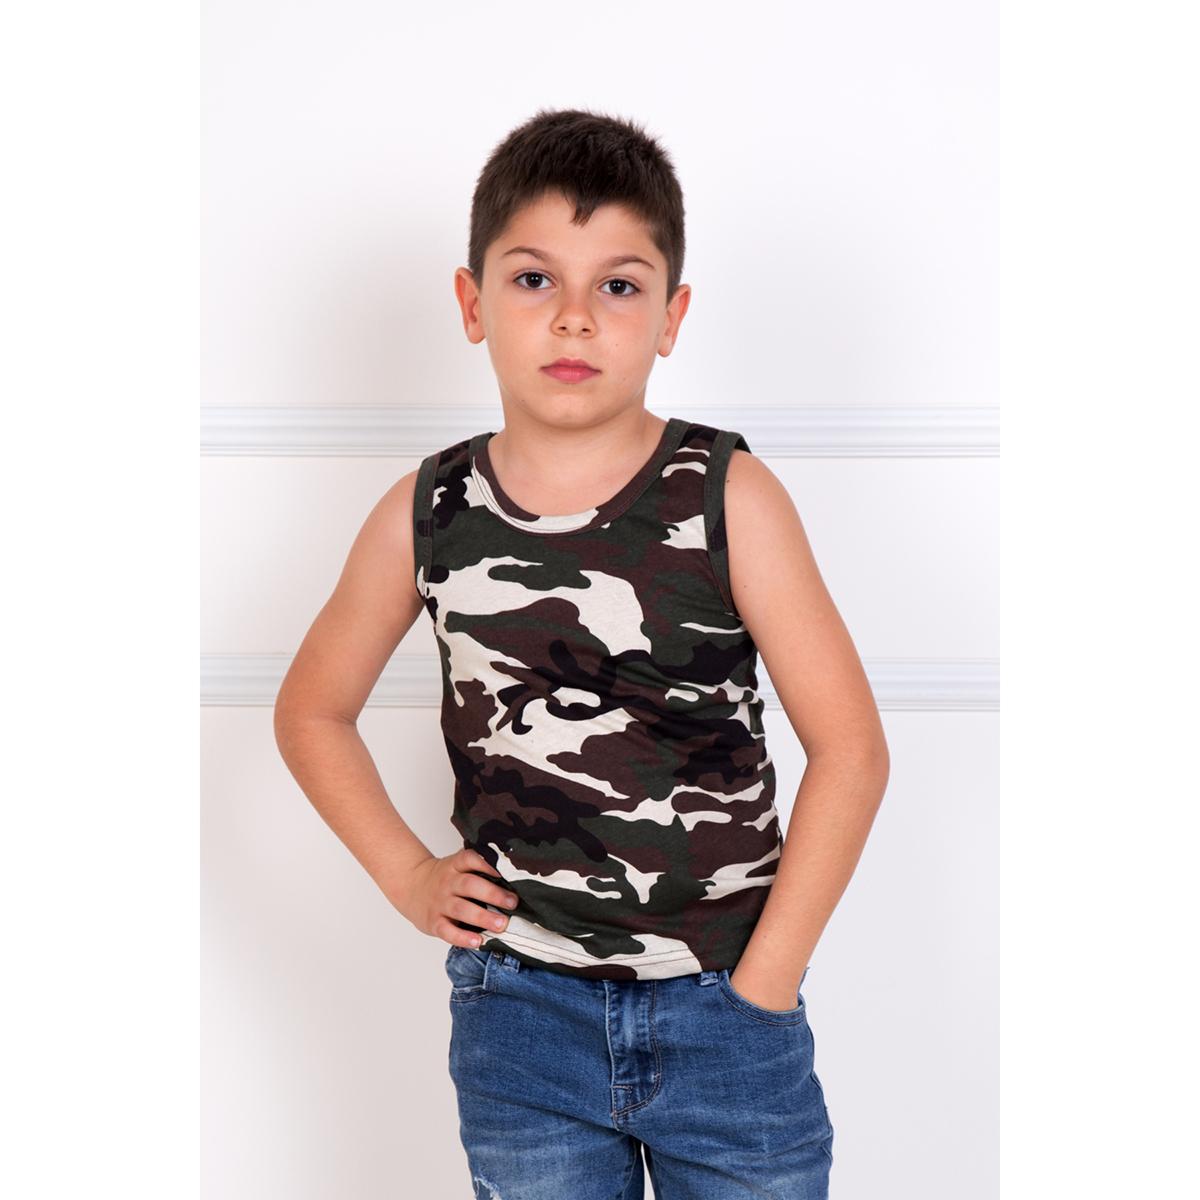 Детская майка Хаки Зеленый, размер 30Футболки и майки<br><br><br>Тип: Дет. футболка<br>Размер: 30<br>Материал: Кулирка